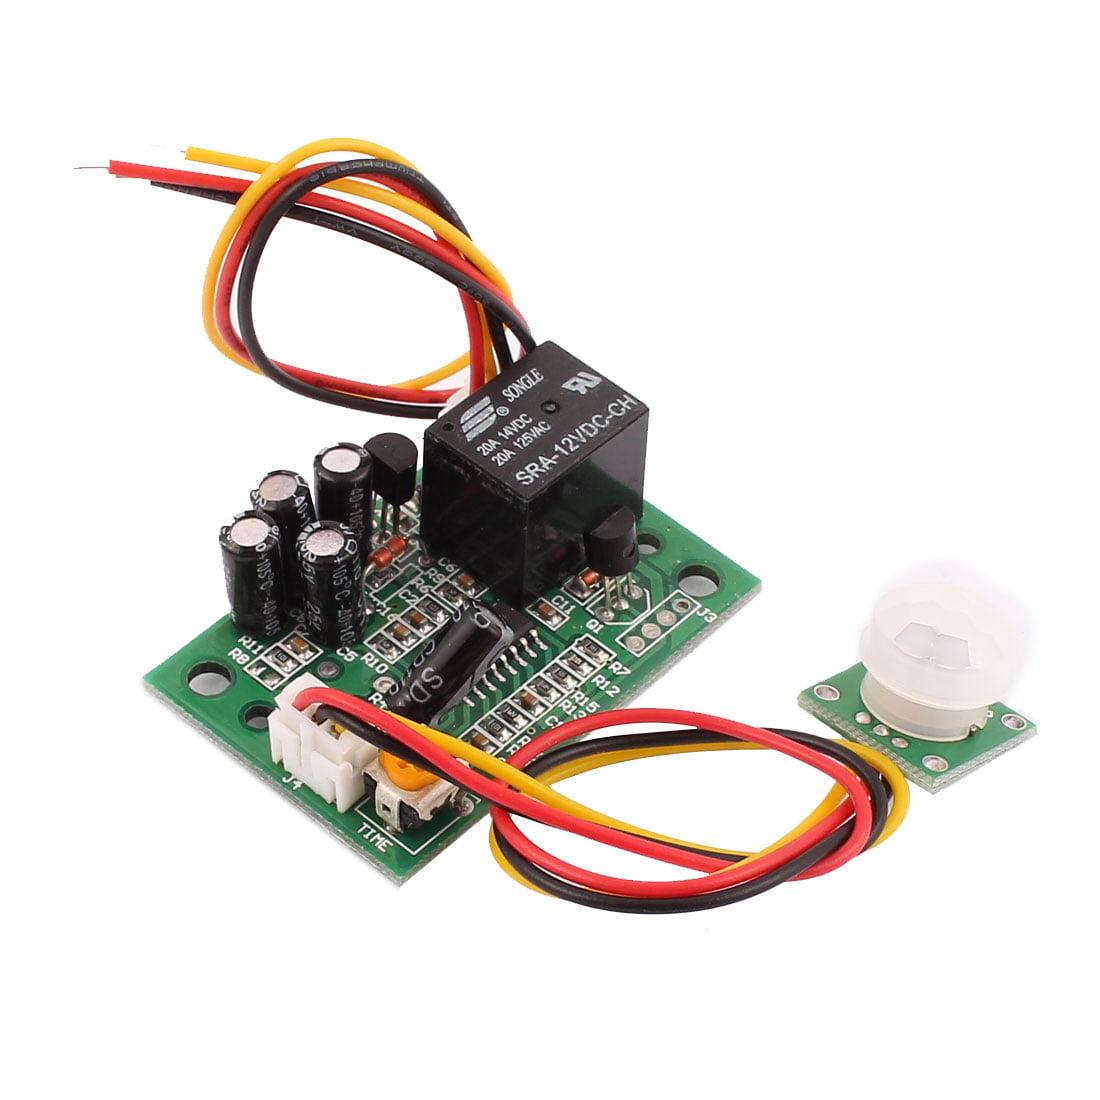 12V DC Human Body Motion Sensor Module Switch Board Infrared Sensor